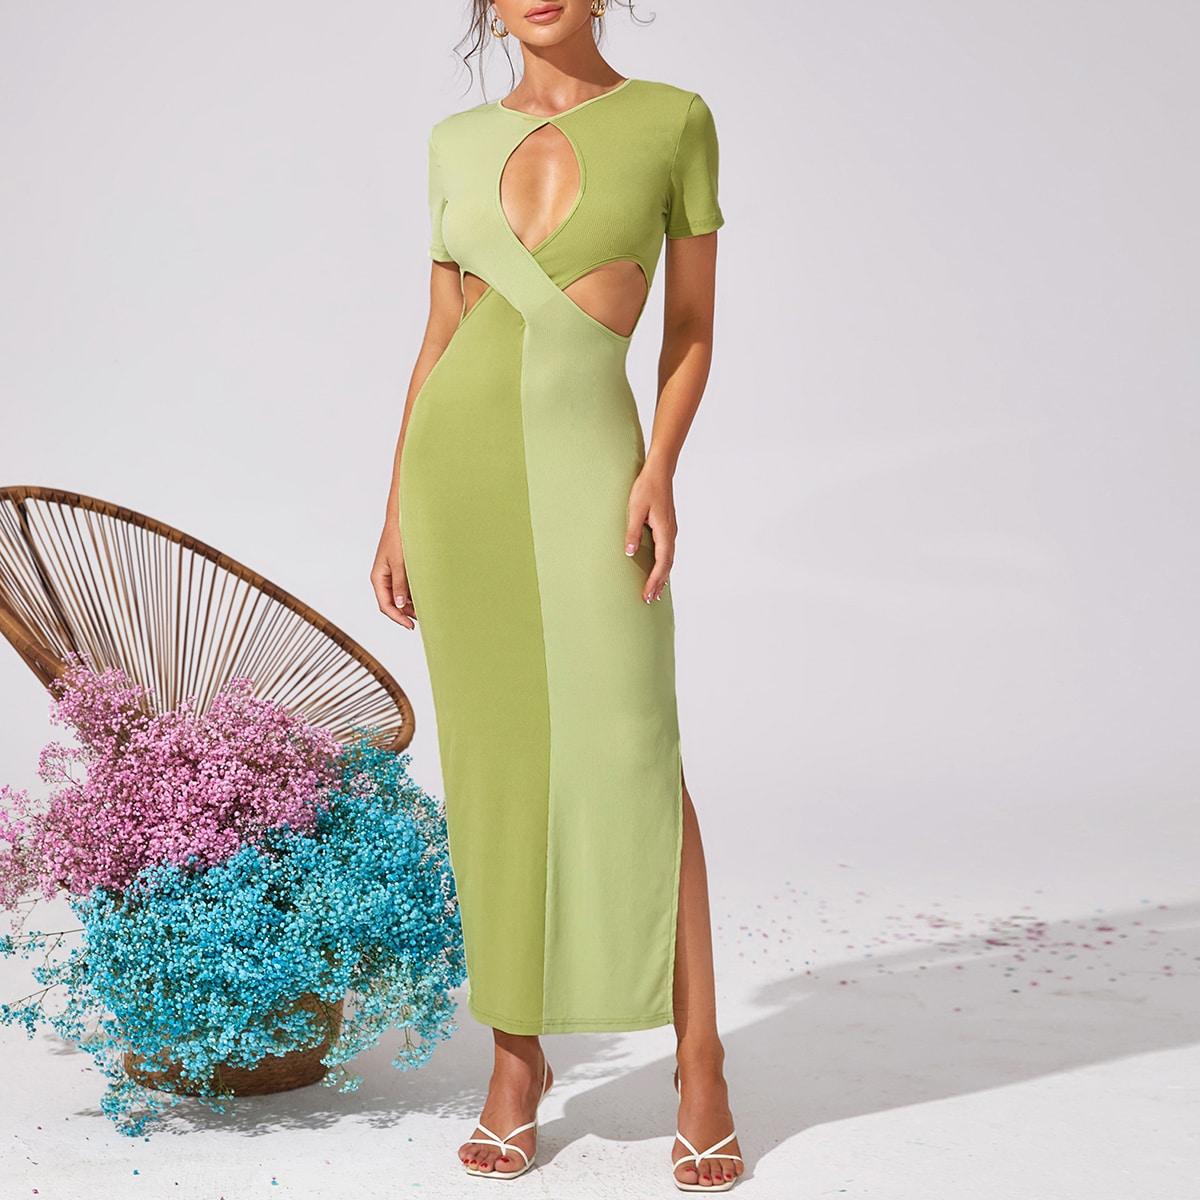 Платье контрастный с разрезом разрез SheIn swdress25210518918